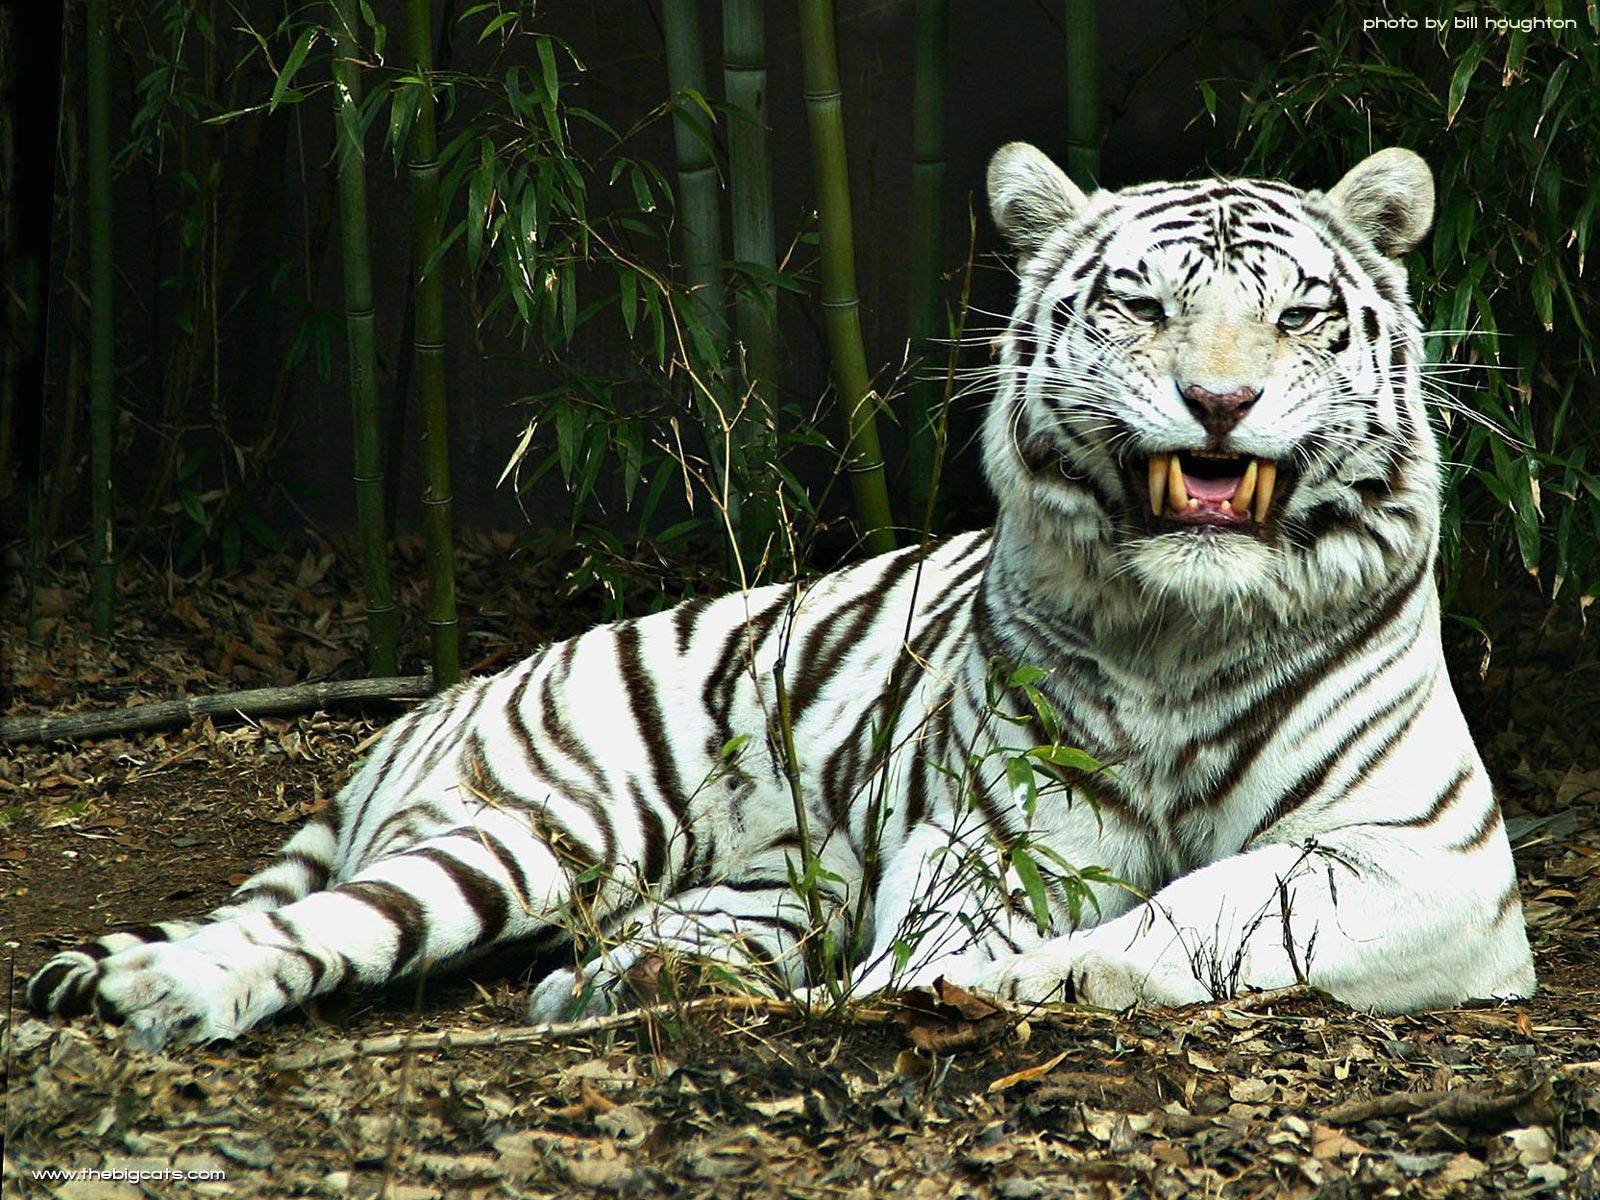 http://3.bp.blogspot.com/-GeKxIoW_lYA/Tv7yflnIZII/AAAAAAAAAdg/ygMkrtcxXKs/s1600/white-tigar-pc-wallpaper-ouradda.jpg